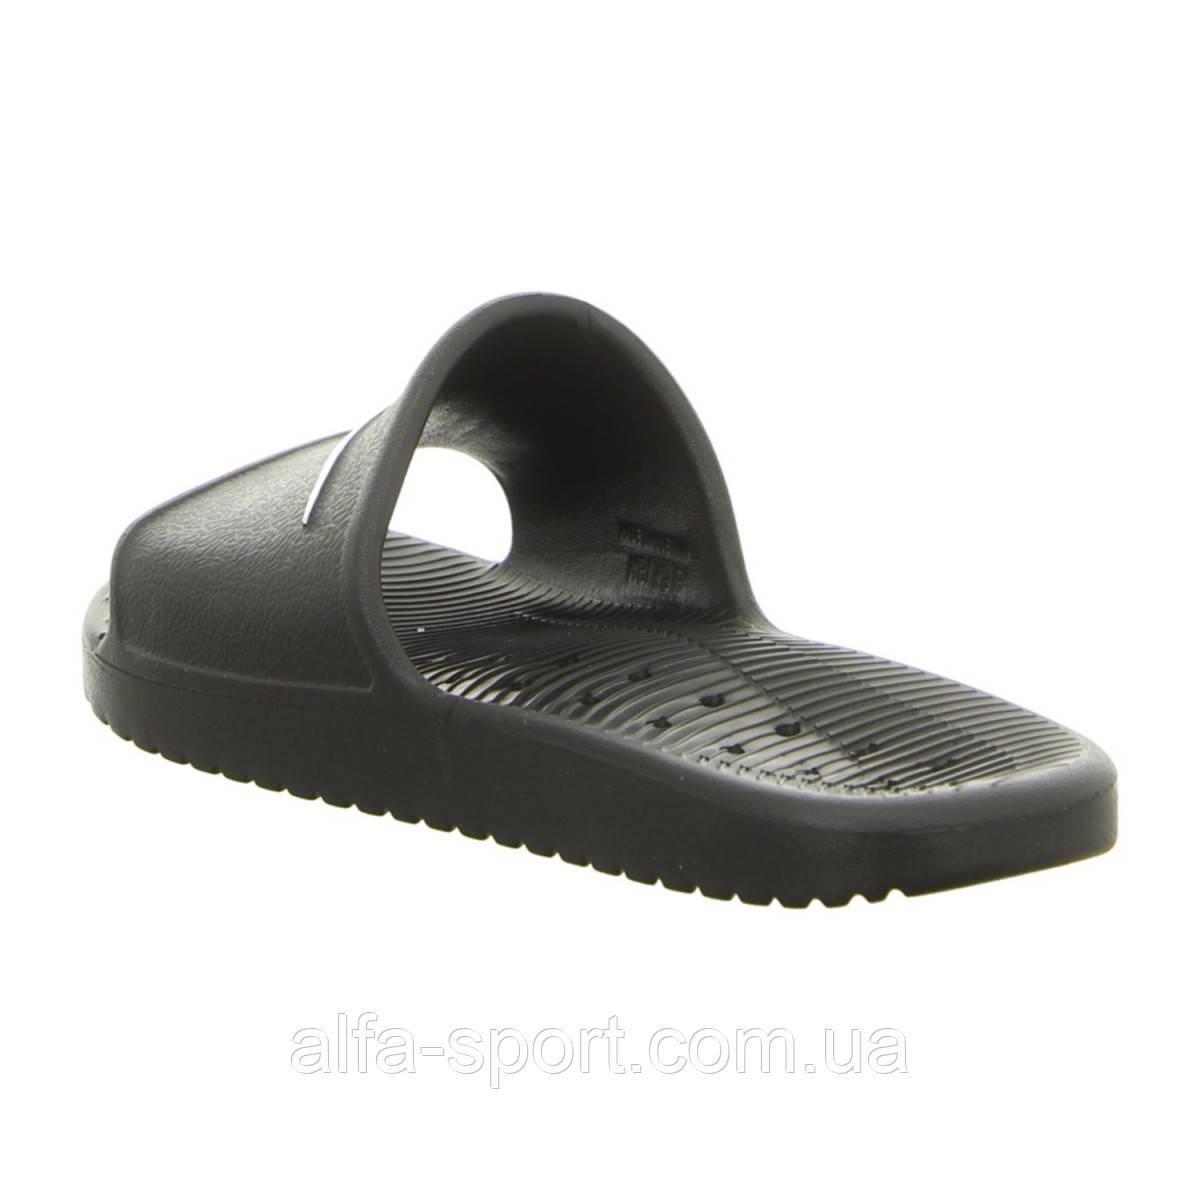 783530b2 Сланцы Nike Kawa Shower (832528-001), цена 680 грн., купить в Харькове —  Prom.ua (ID#512372734)